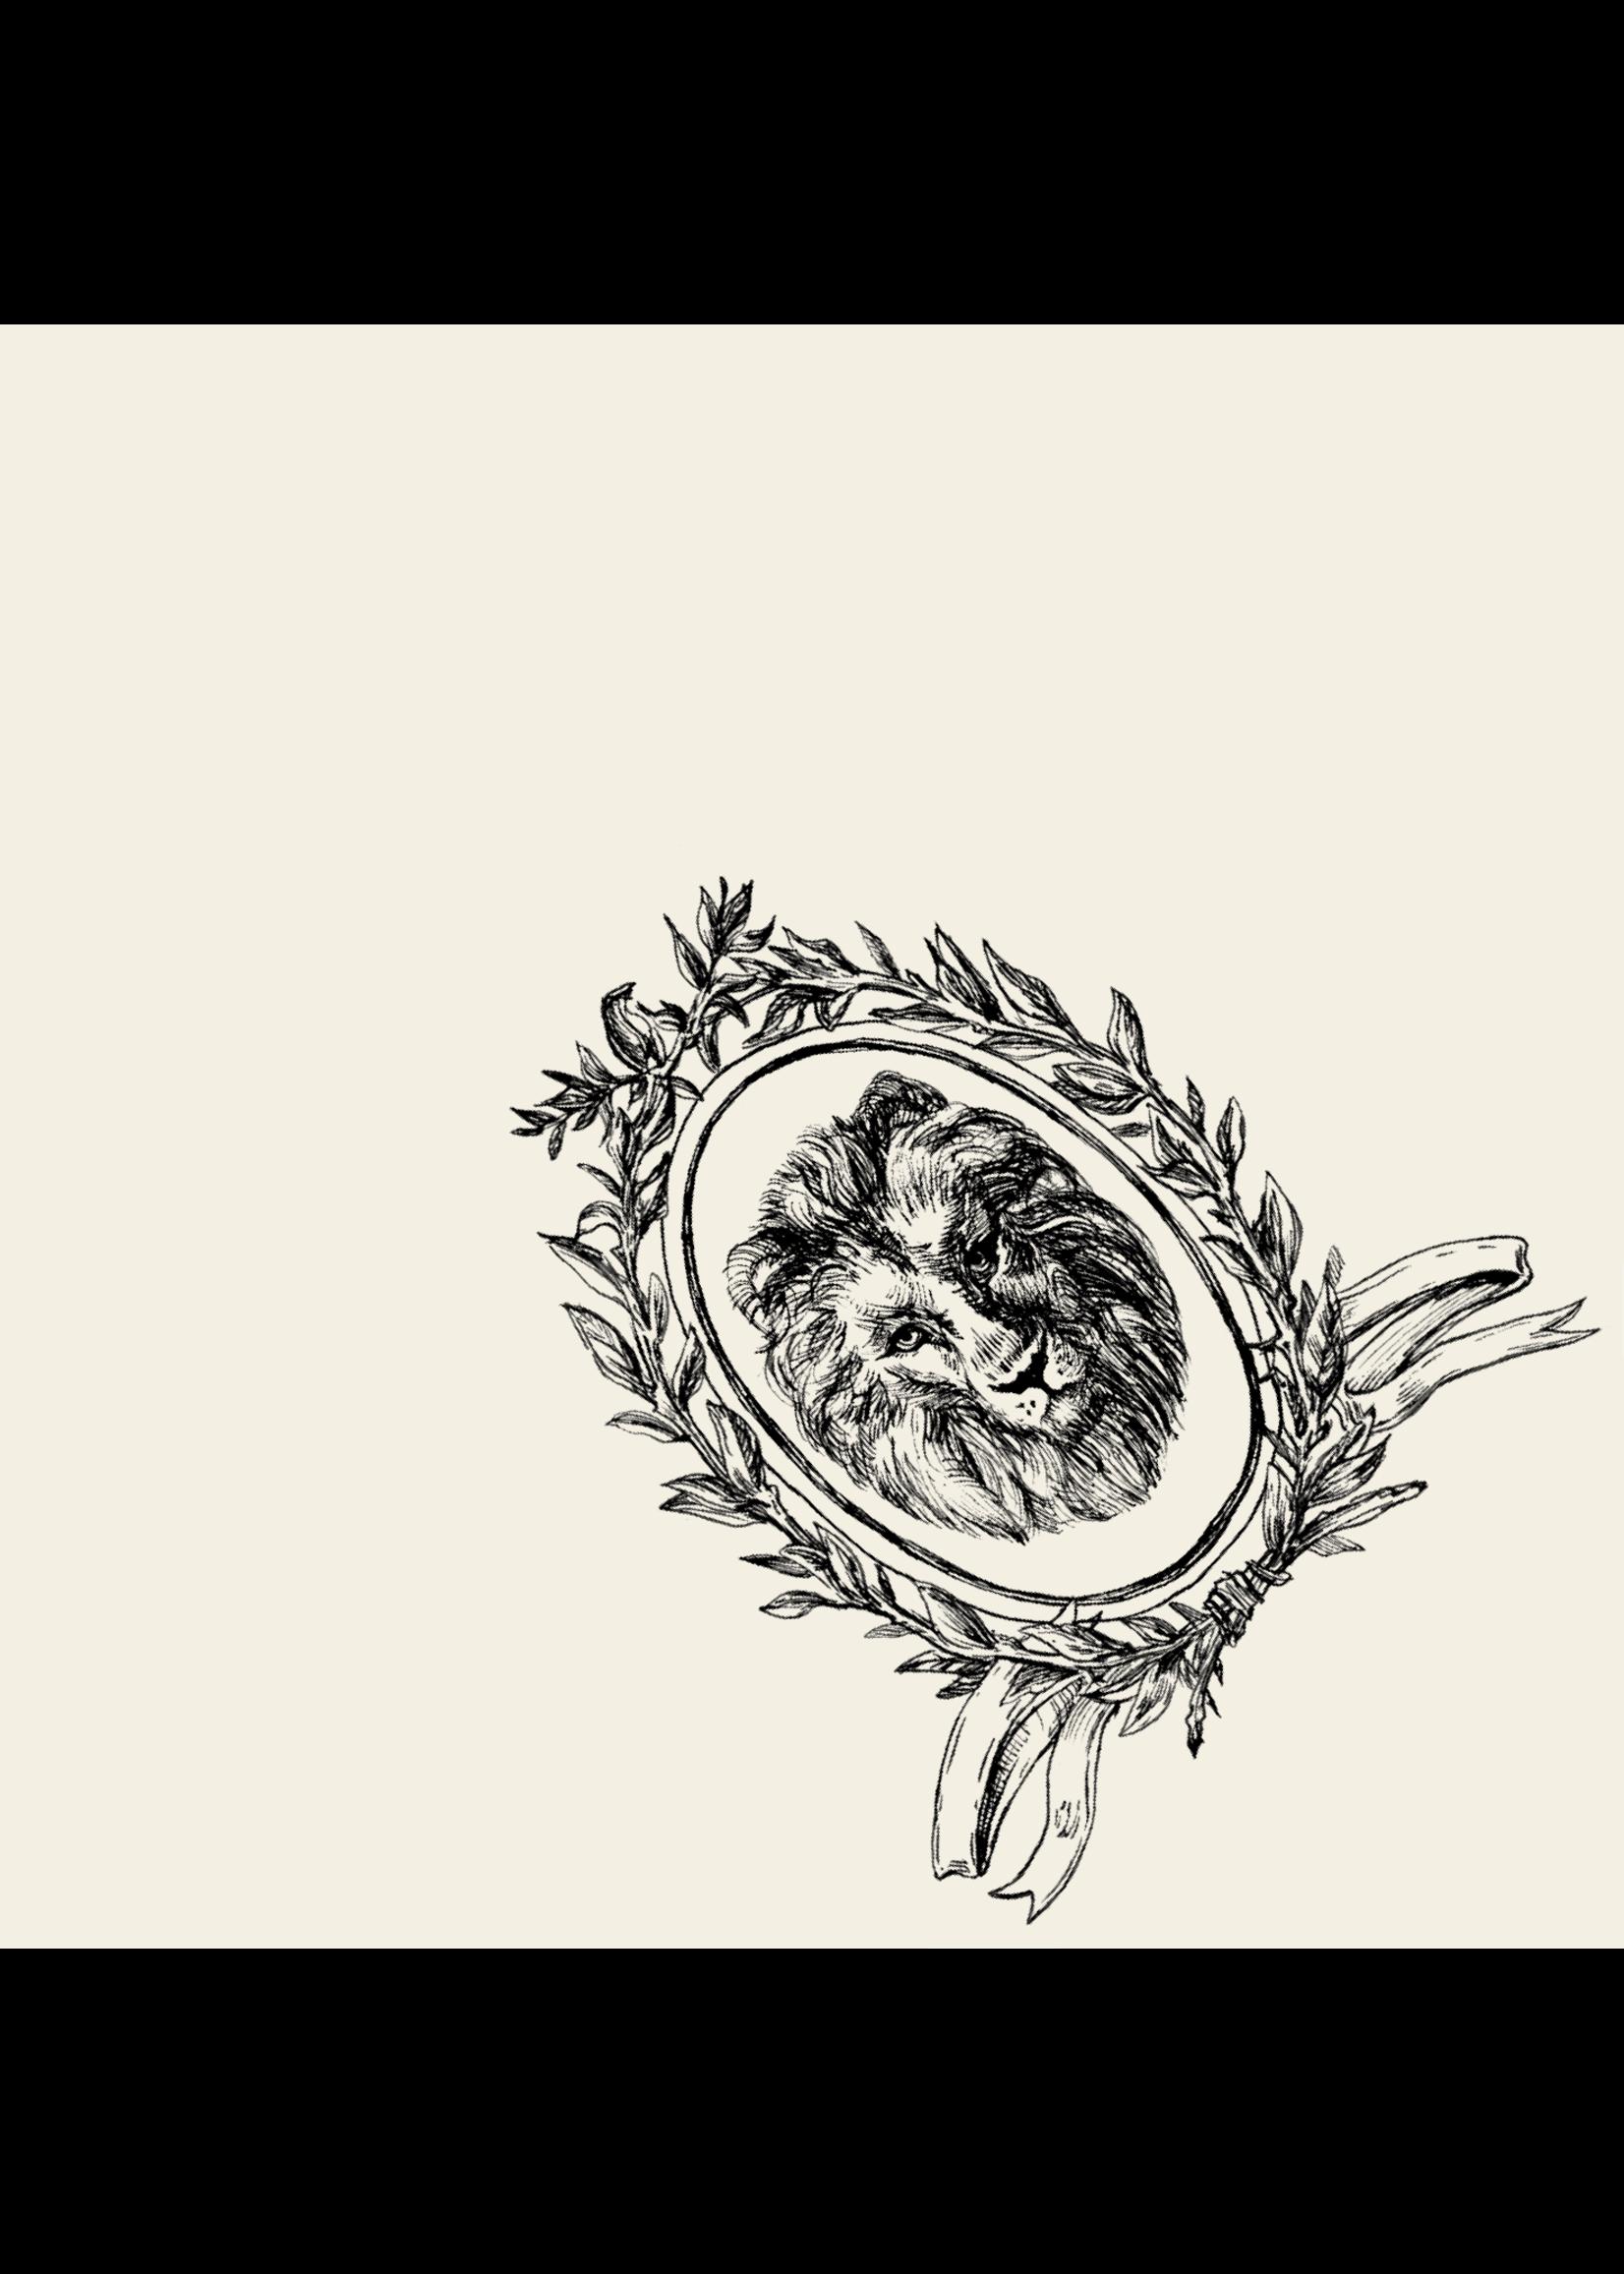 Hester & Cook Paper Cocktail Napkins - Majestic Crest (pack of 20)